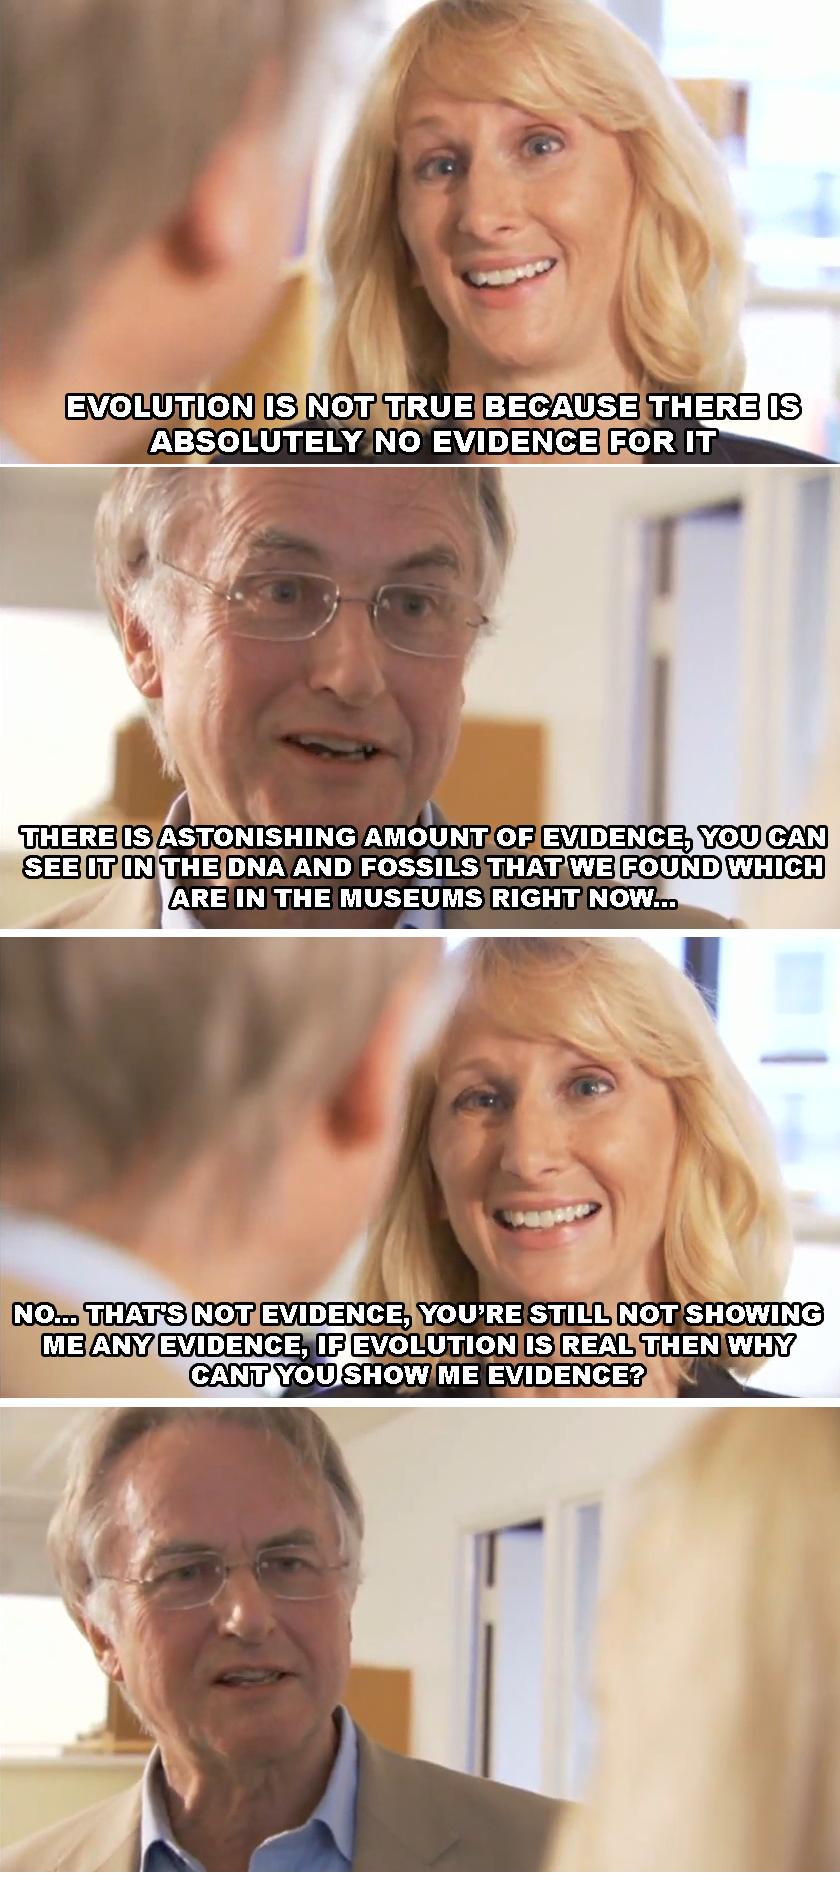 Richard Dawkins. www.youtube.com/watch?v=YFjoEgYOgRo.